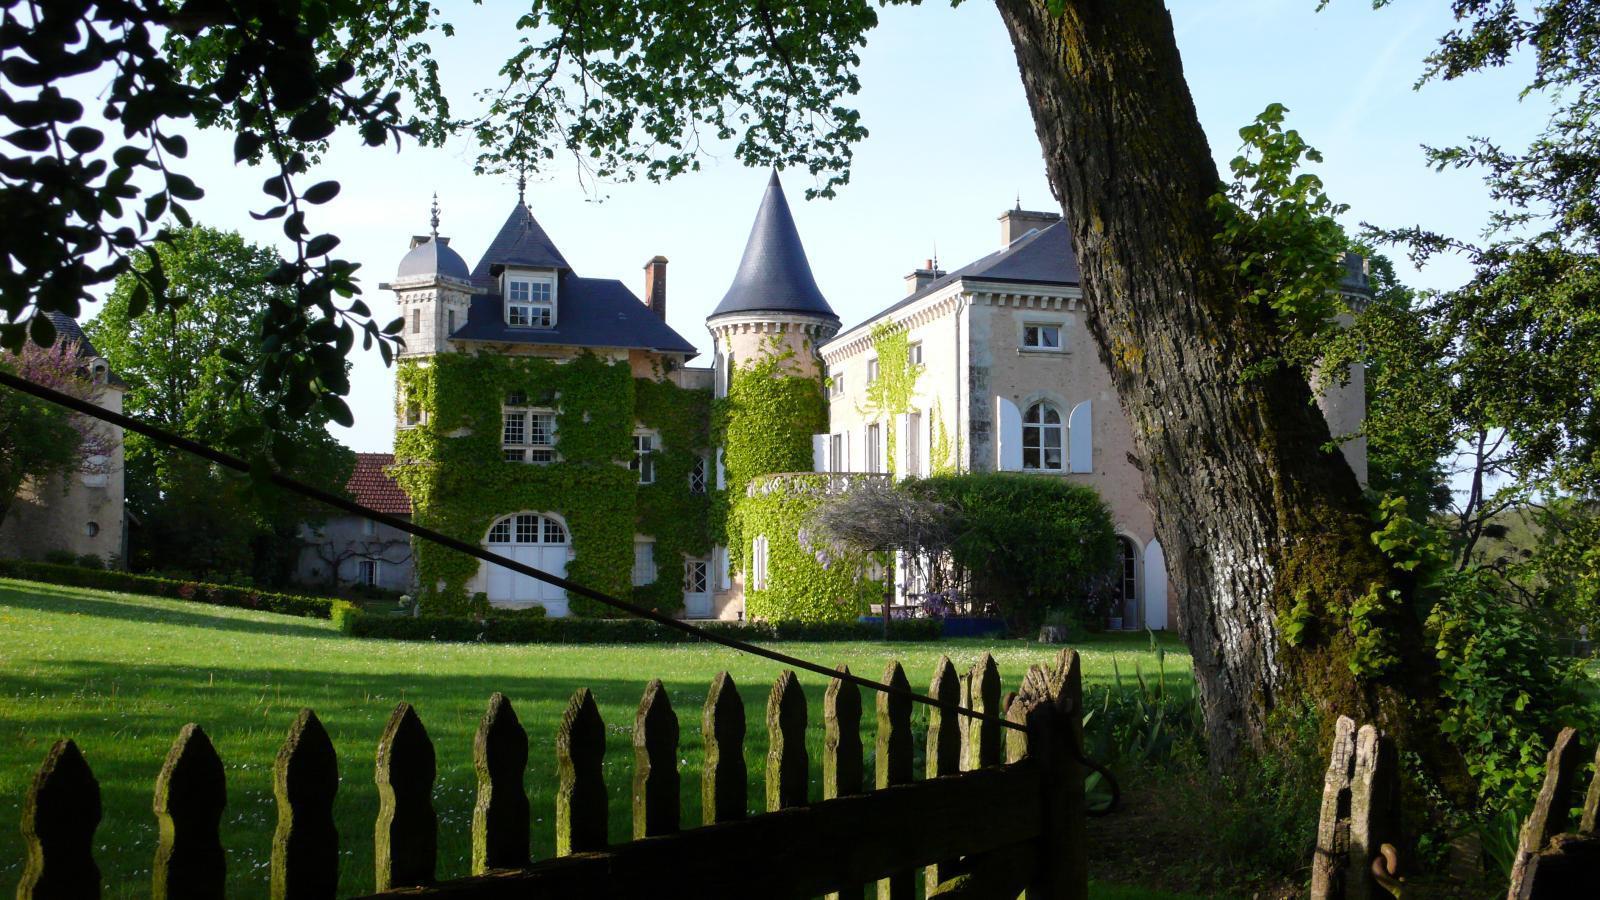 Gites Chambres Dhtes Locations De Vacances Indre 36